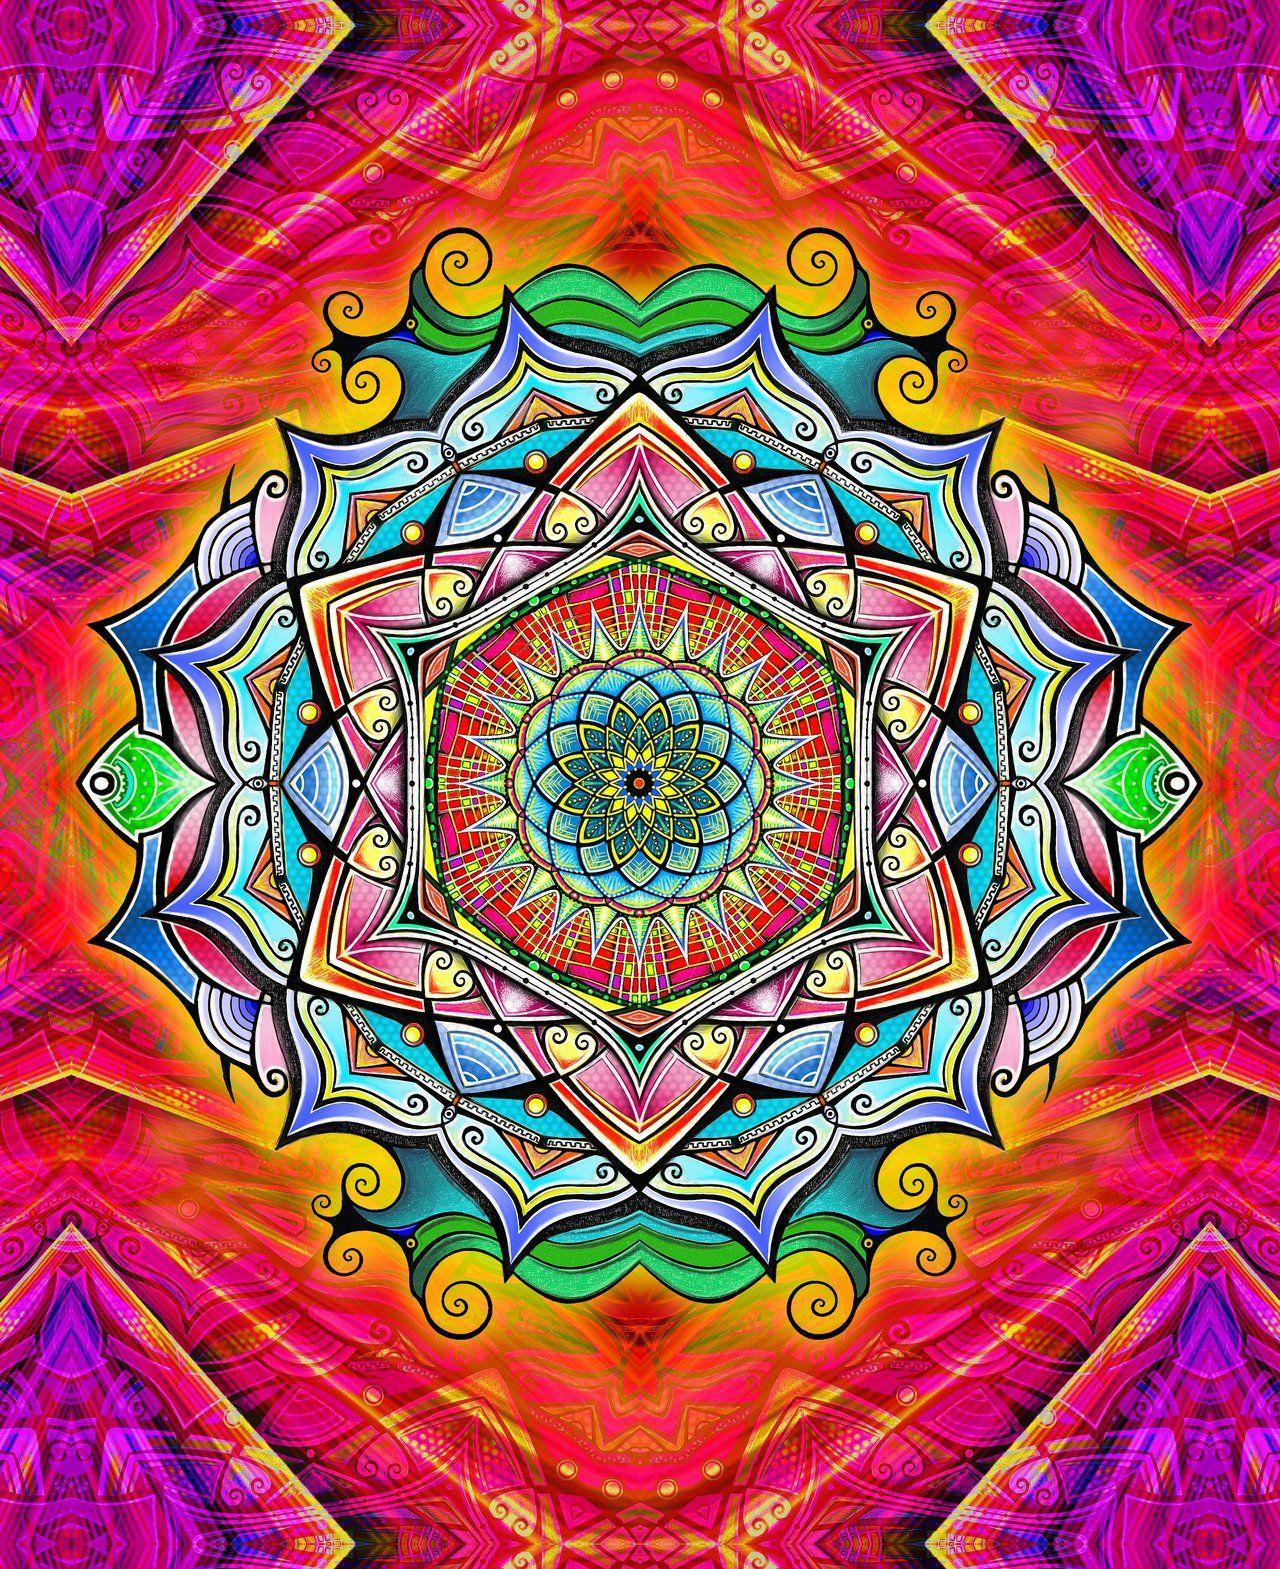 Mandala HD 2 by relplus on DeviantArt